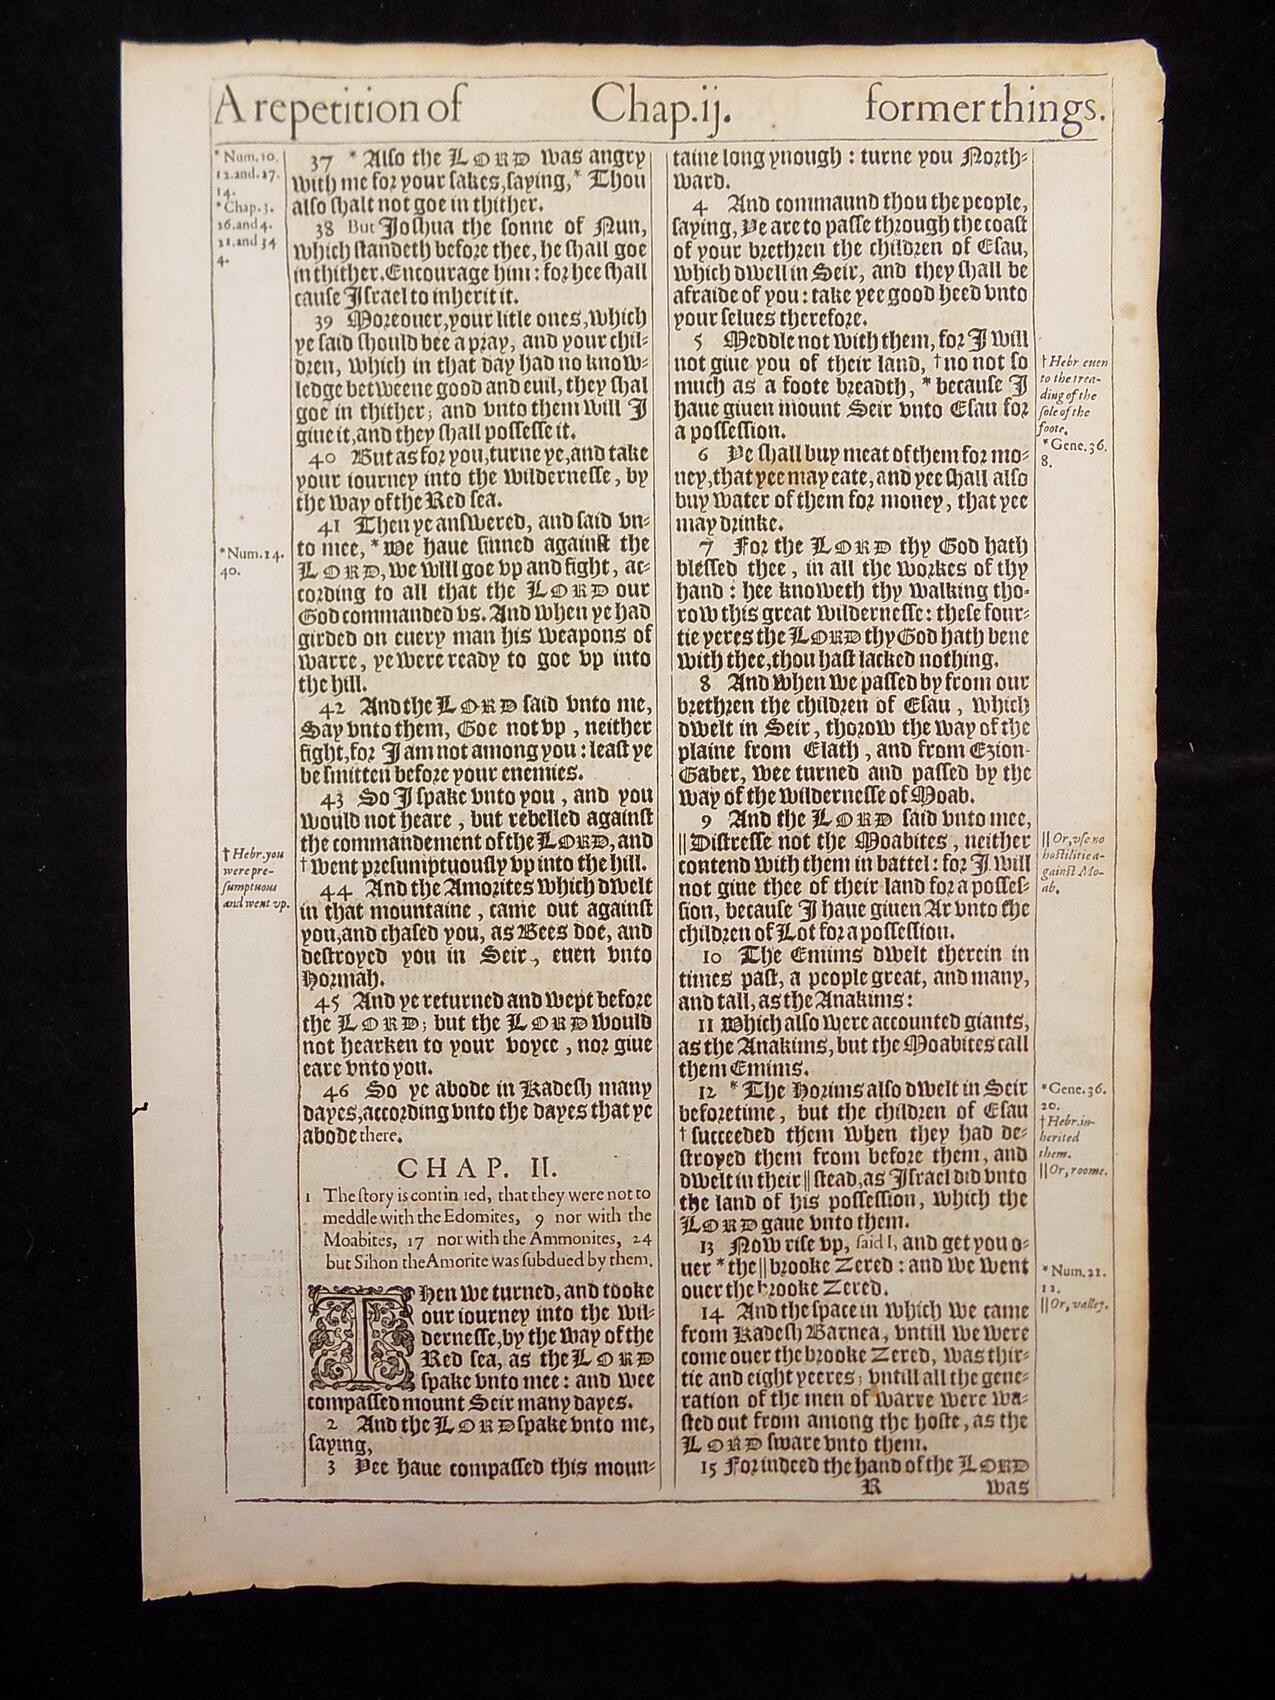 1611 KING JAMES BIBLE LEAVES BOOK OF DEUTERONOMY 316 ANTIQUE BIBLES